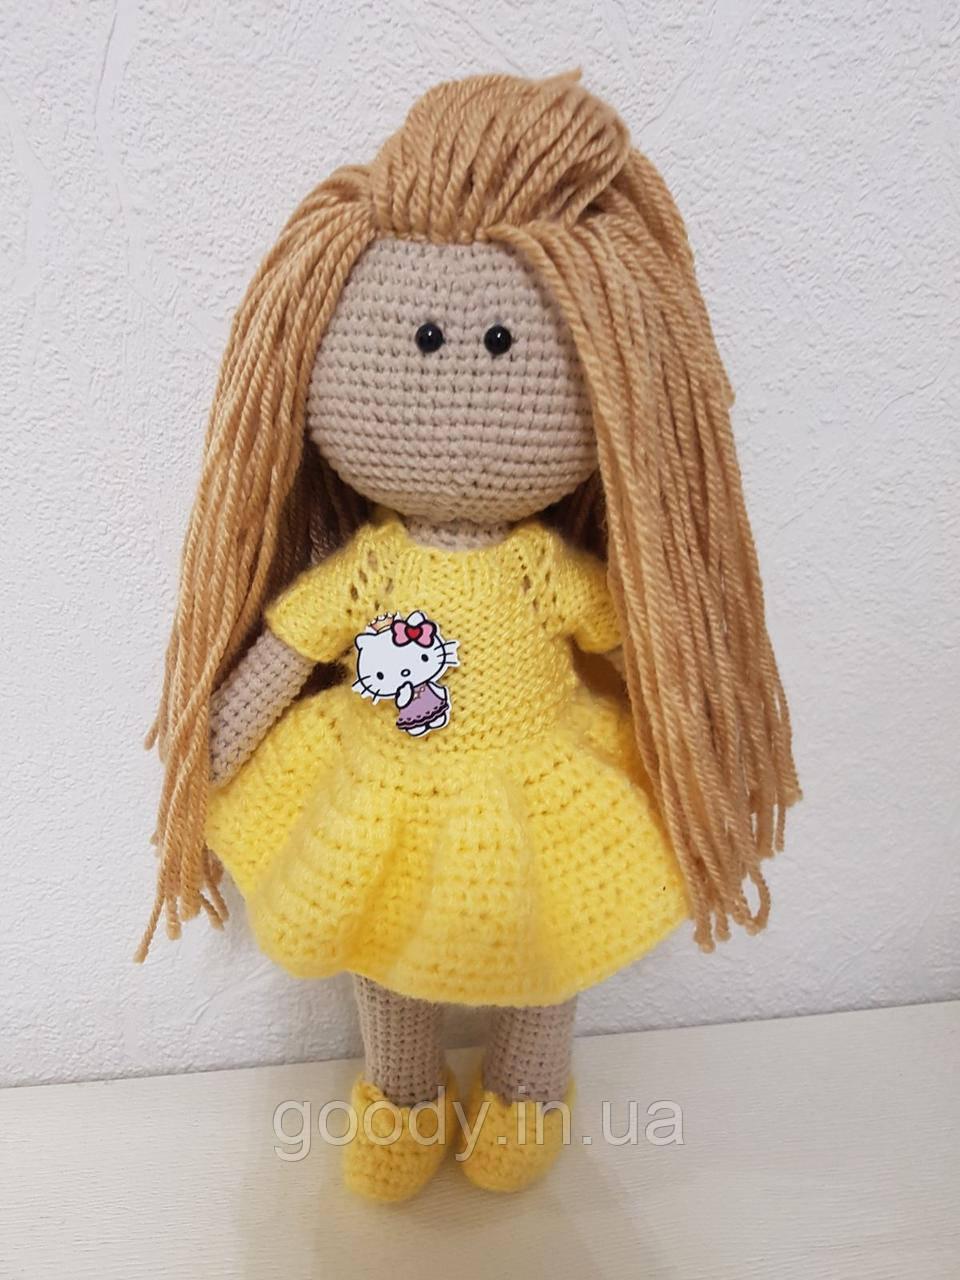 Лялька інтер'єрна (Тильда) 30 cm